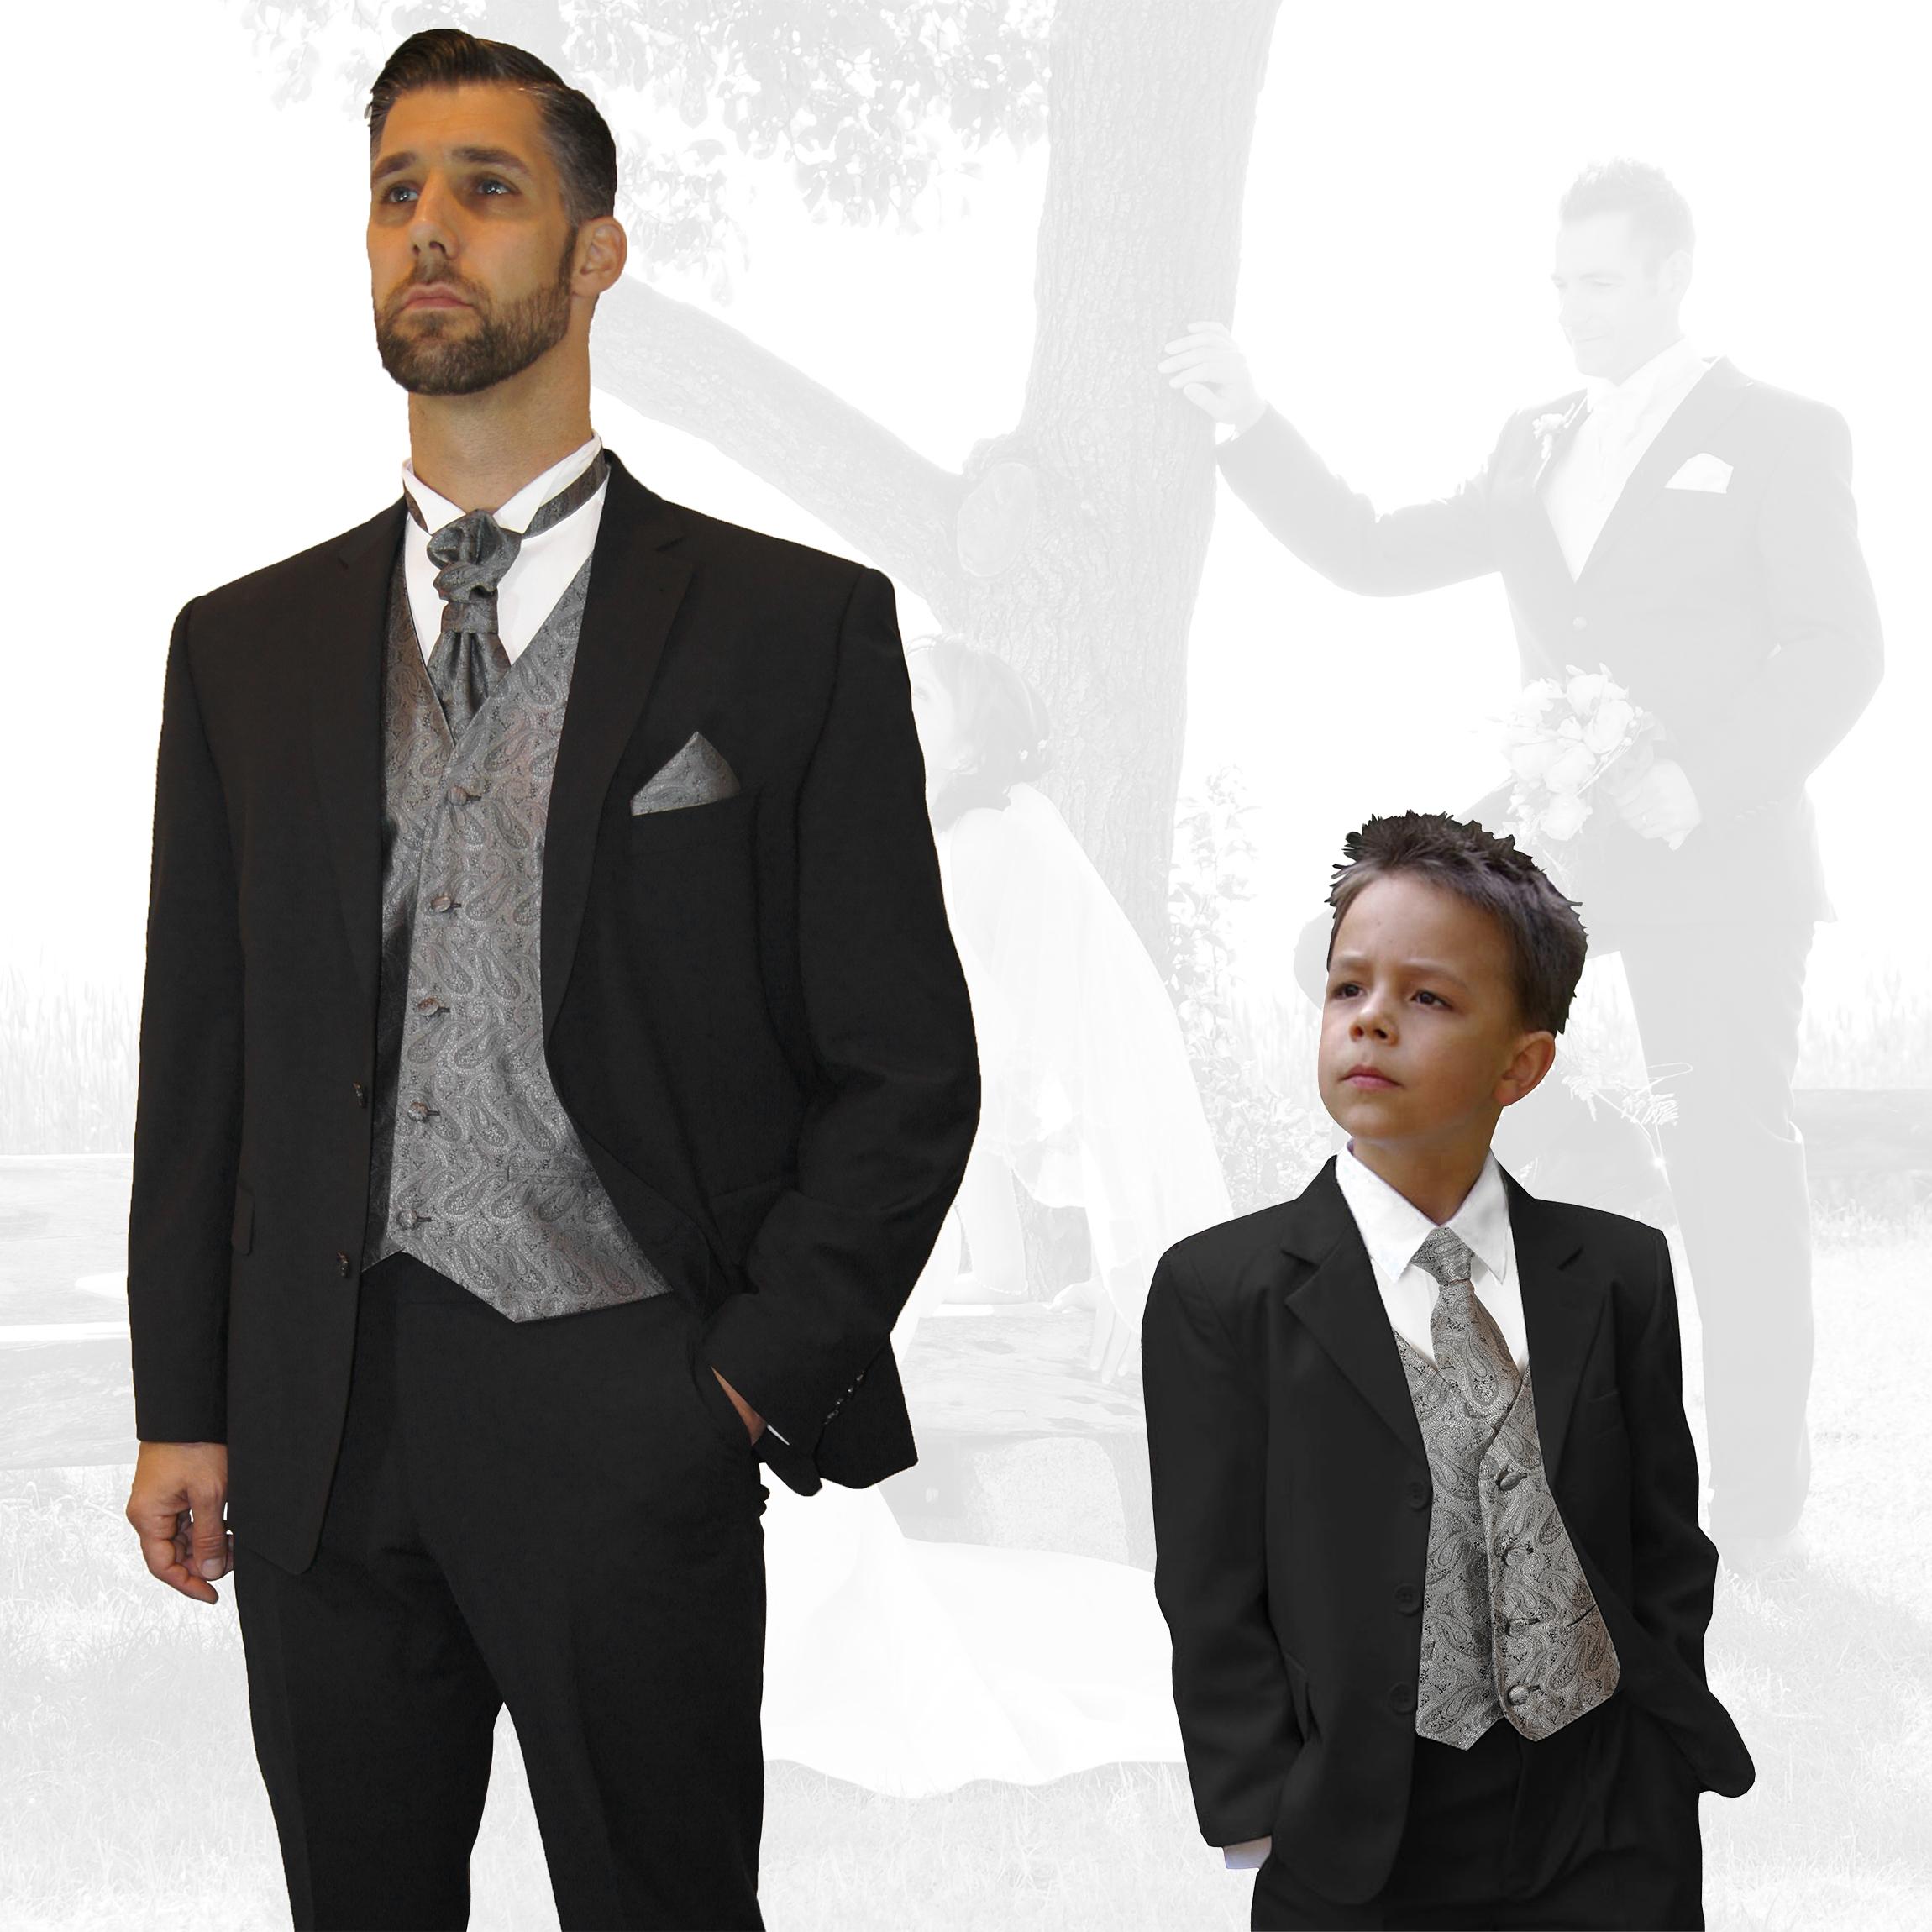 c1f029b6f6ced3 Partnerkombi - schwarz und grau paisley Hochzeitsanzug Set 7tlg +  Festlicher Jungenanzug Set 5tlg